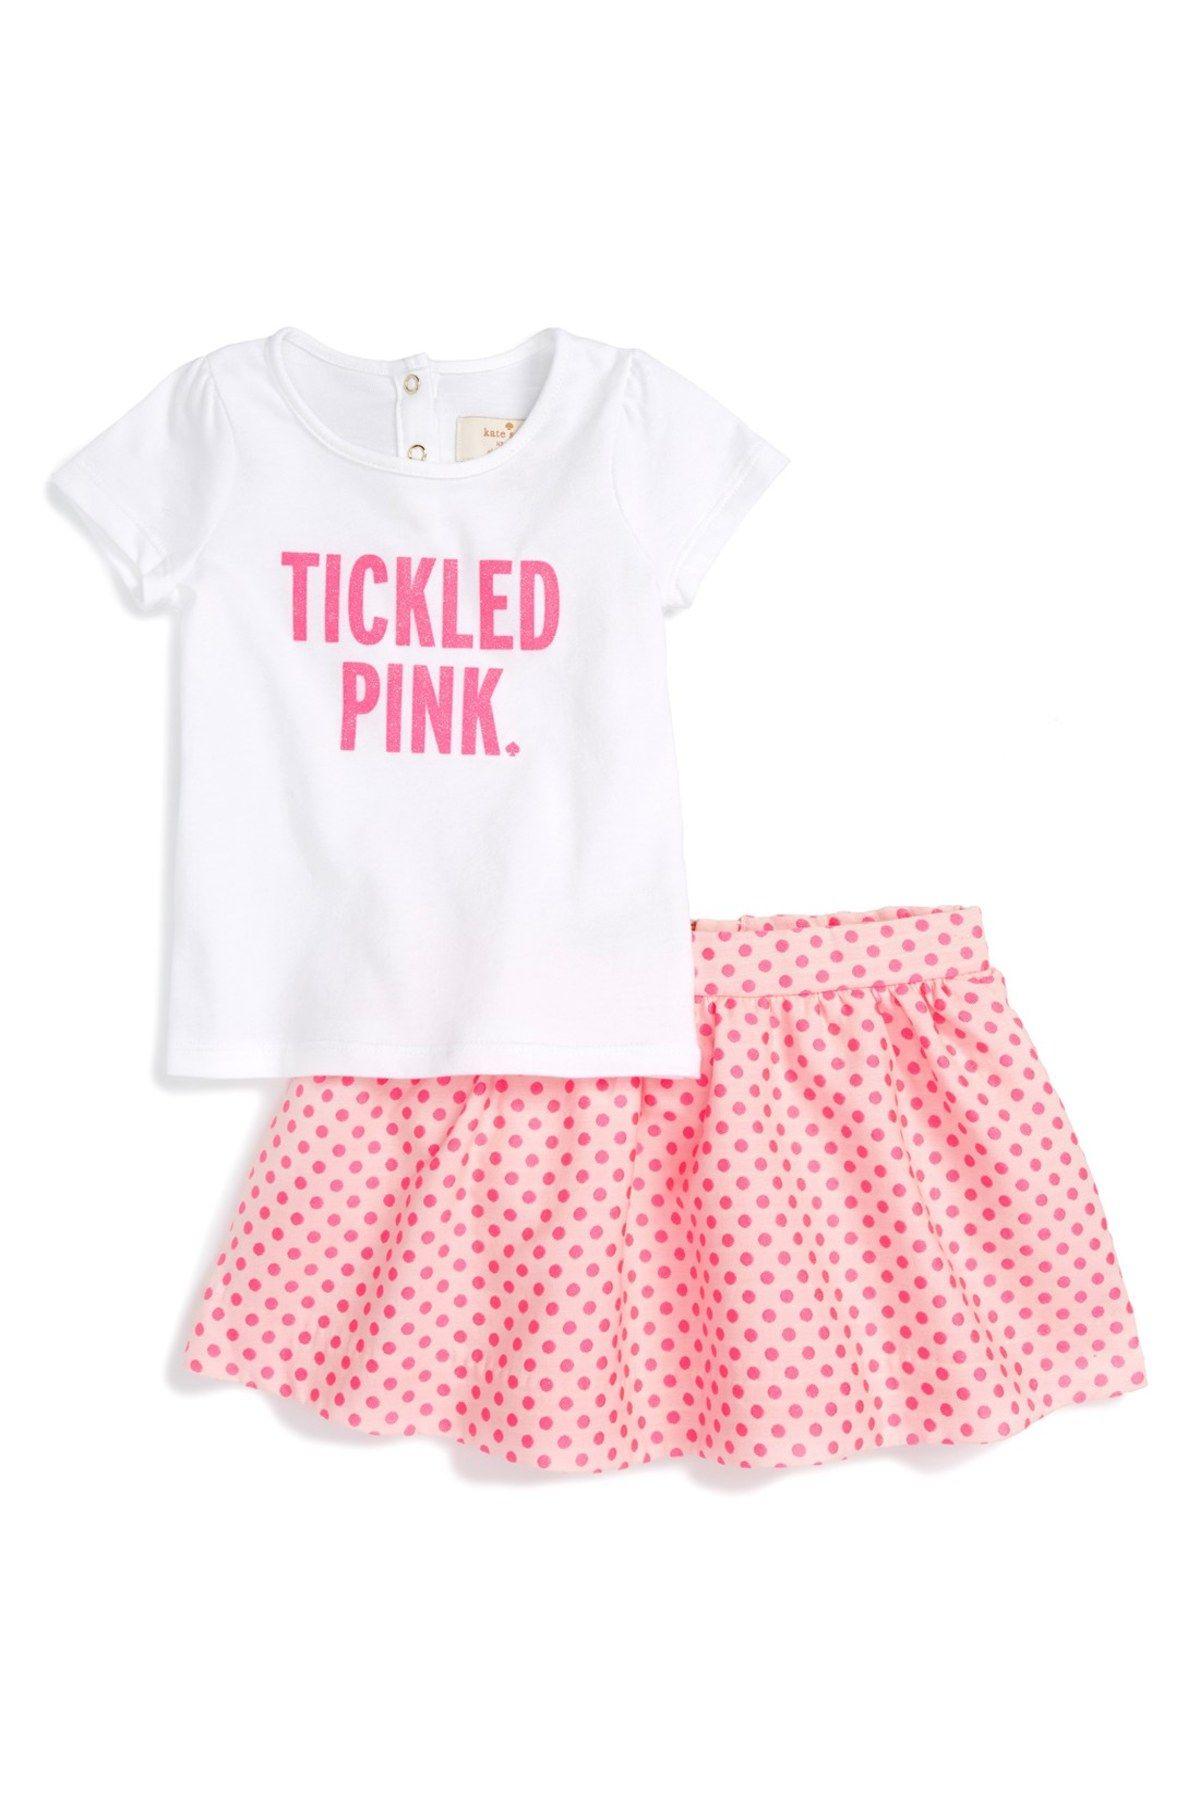 Kate Spade tickled pink tee & skirt set Baby Girls